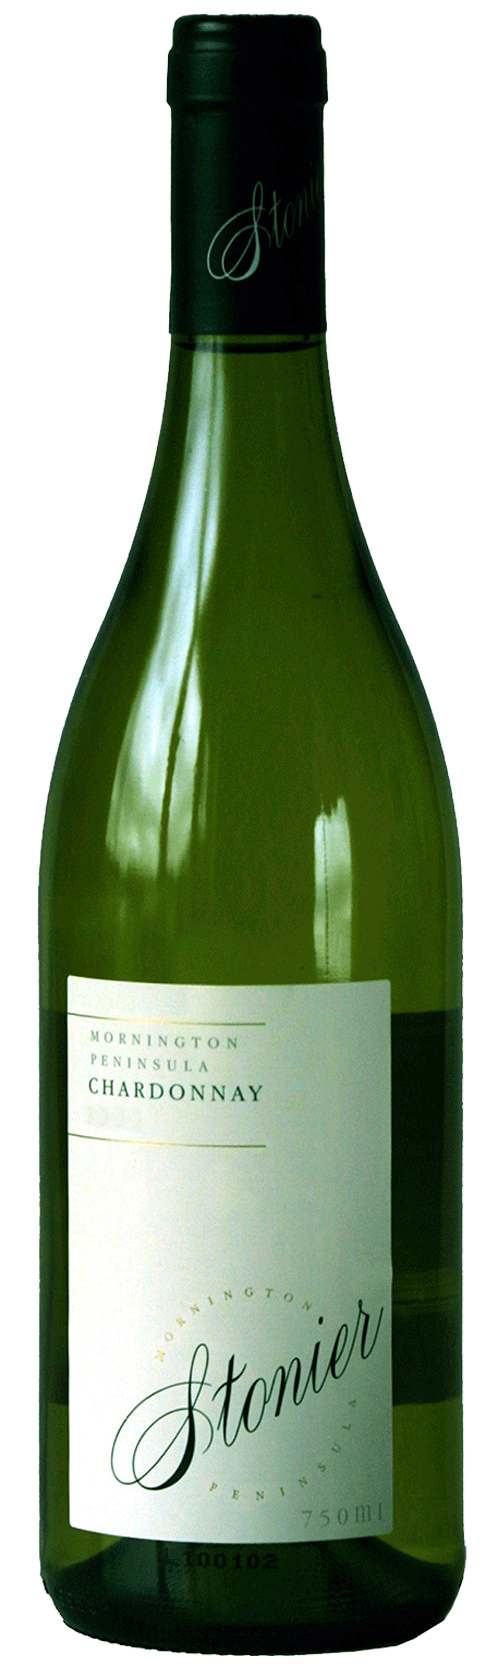 Stonier Chardonnay 2011